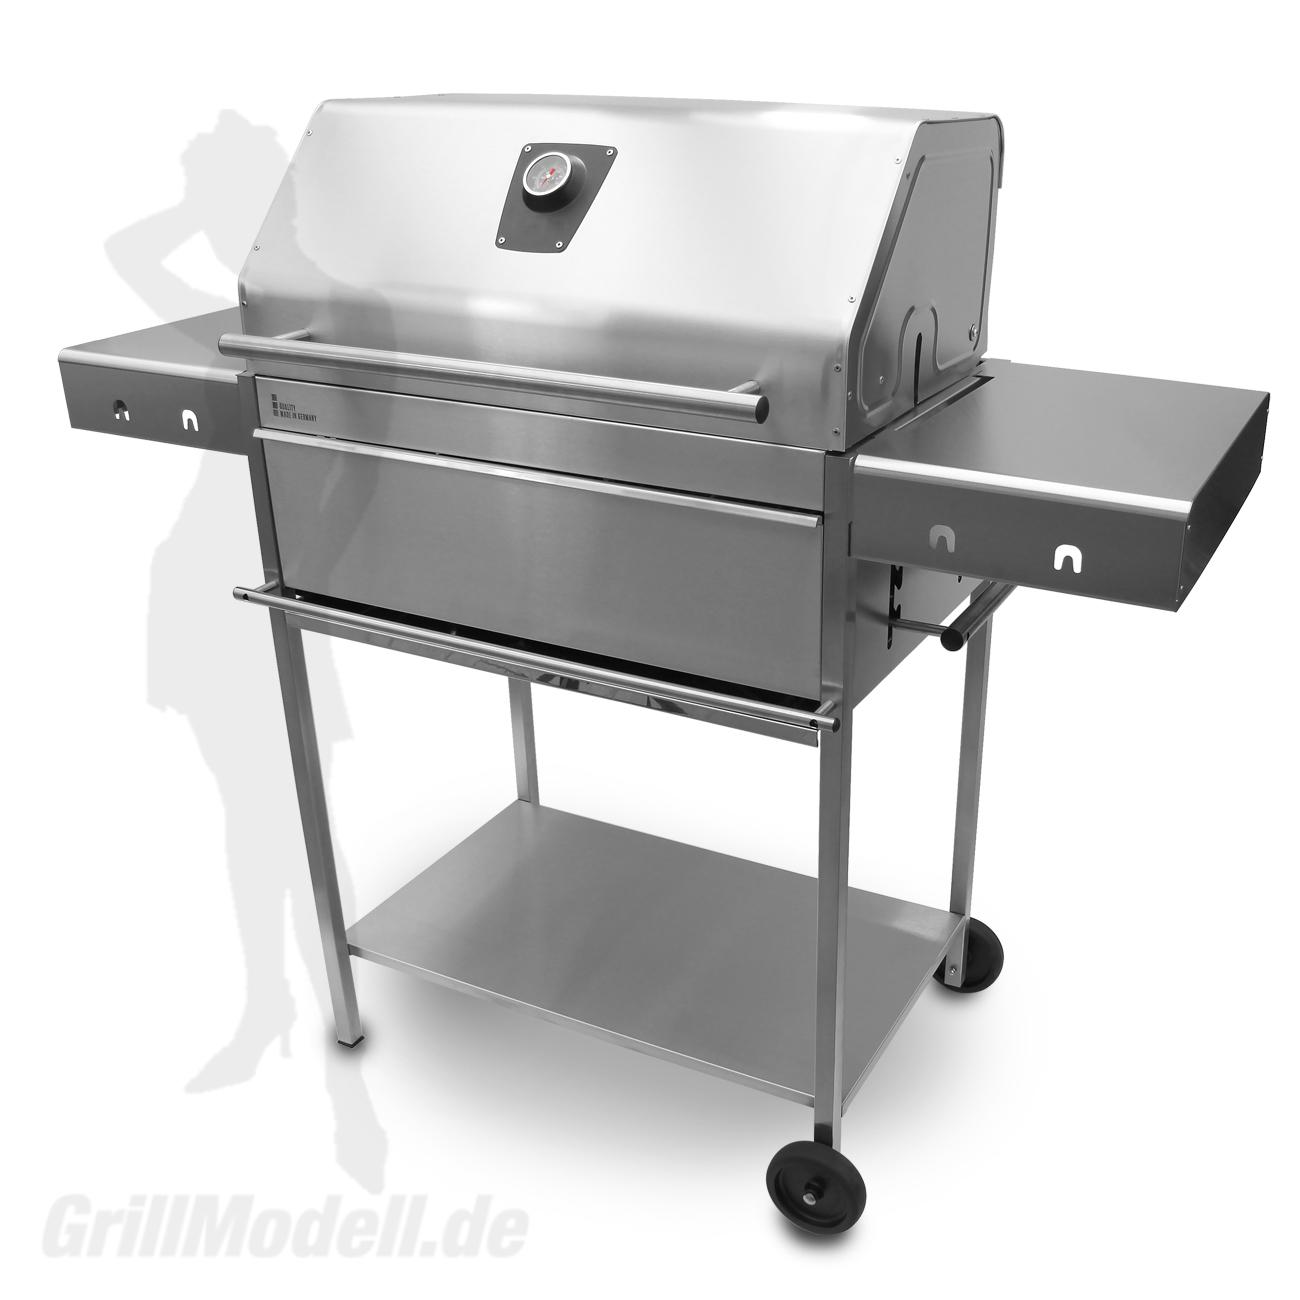 Holzkohlegrill Edelstahlgrill Edelstar XL Profi komplett aus Edelstahl mit Grillhaube